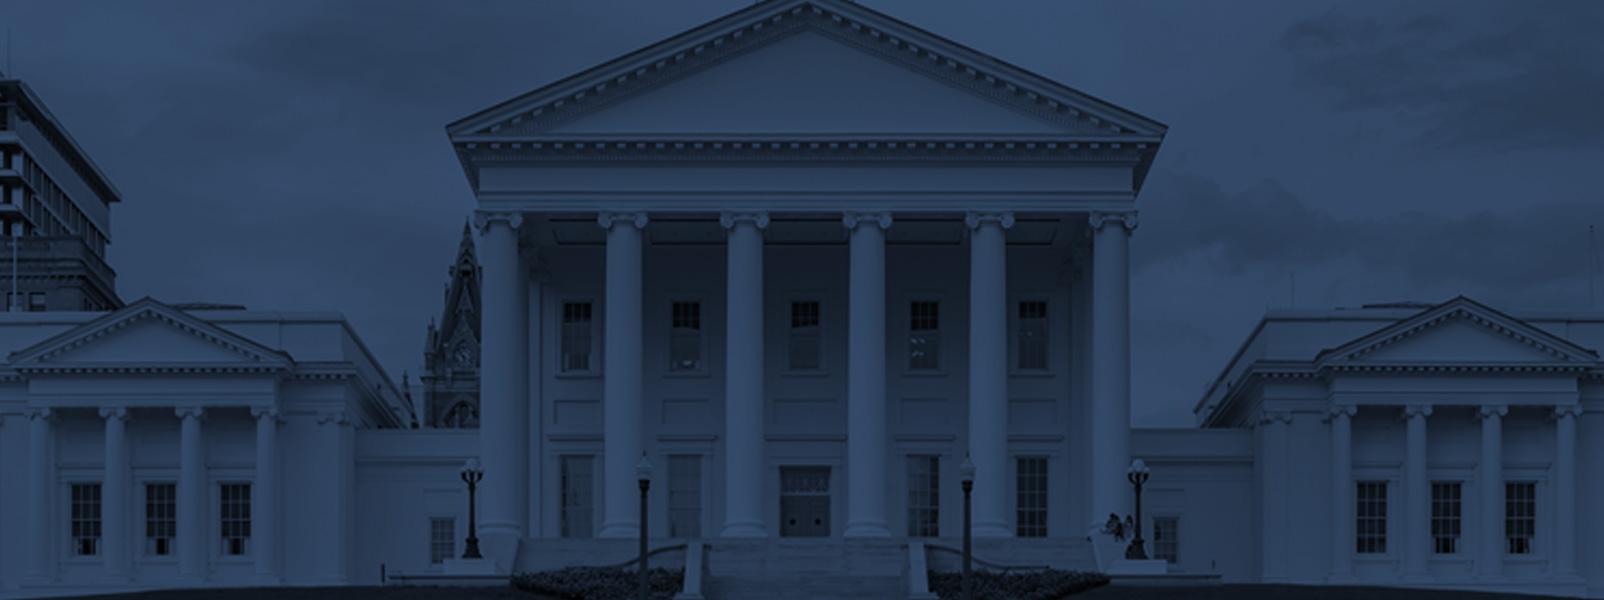 VIRGINIA: SUPPRESSOR BAN PASSES HOUSE